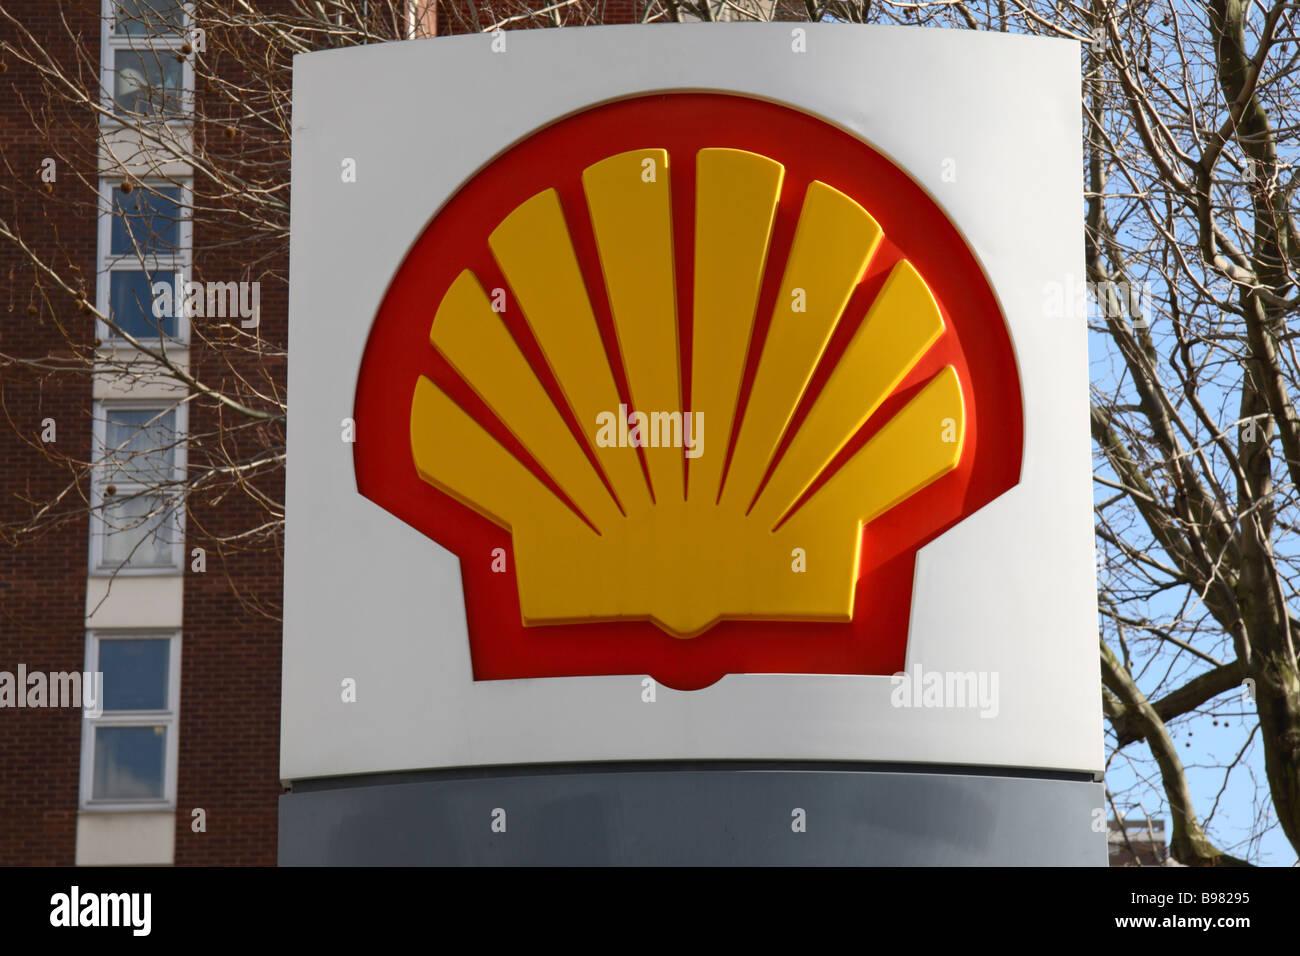 the royal dutch shell logo on a sign outside a petrol